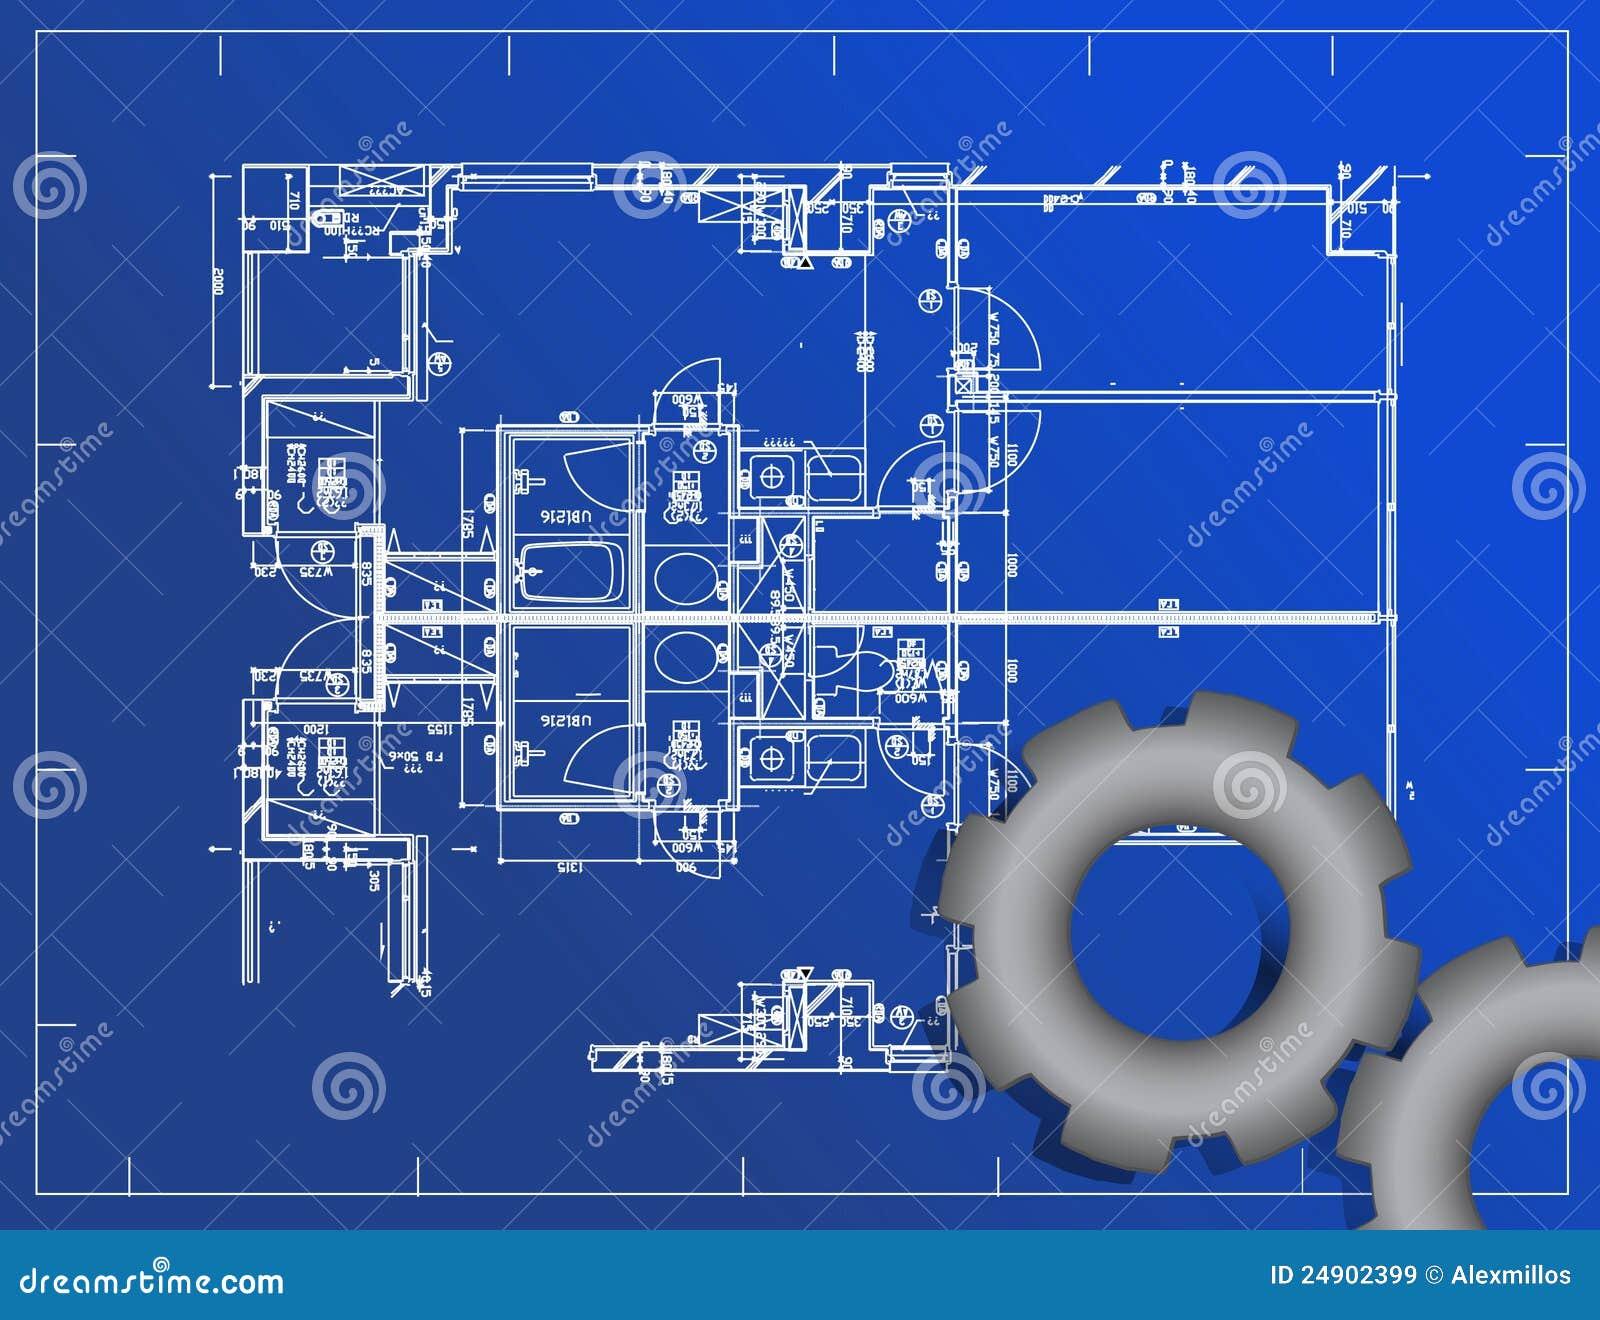 Blueprint stock vector illustration of document idea 24902399 download blueprint stock vector illustration of document idea 24902399 malvernweather Choice Image